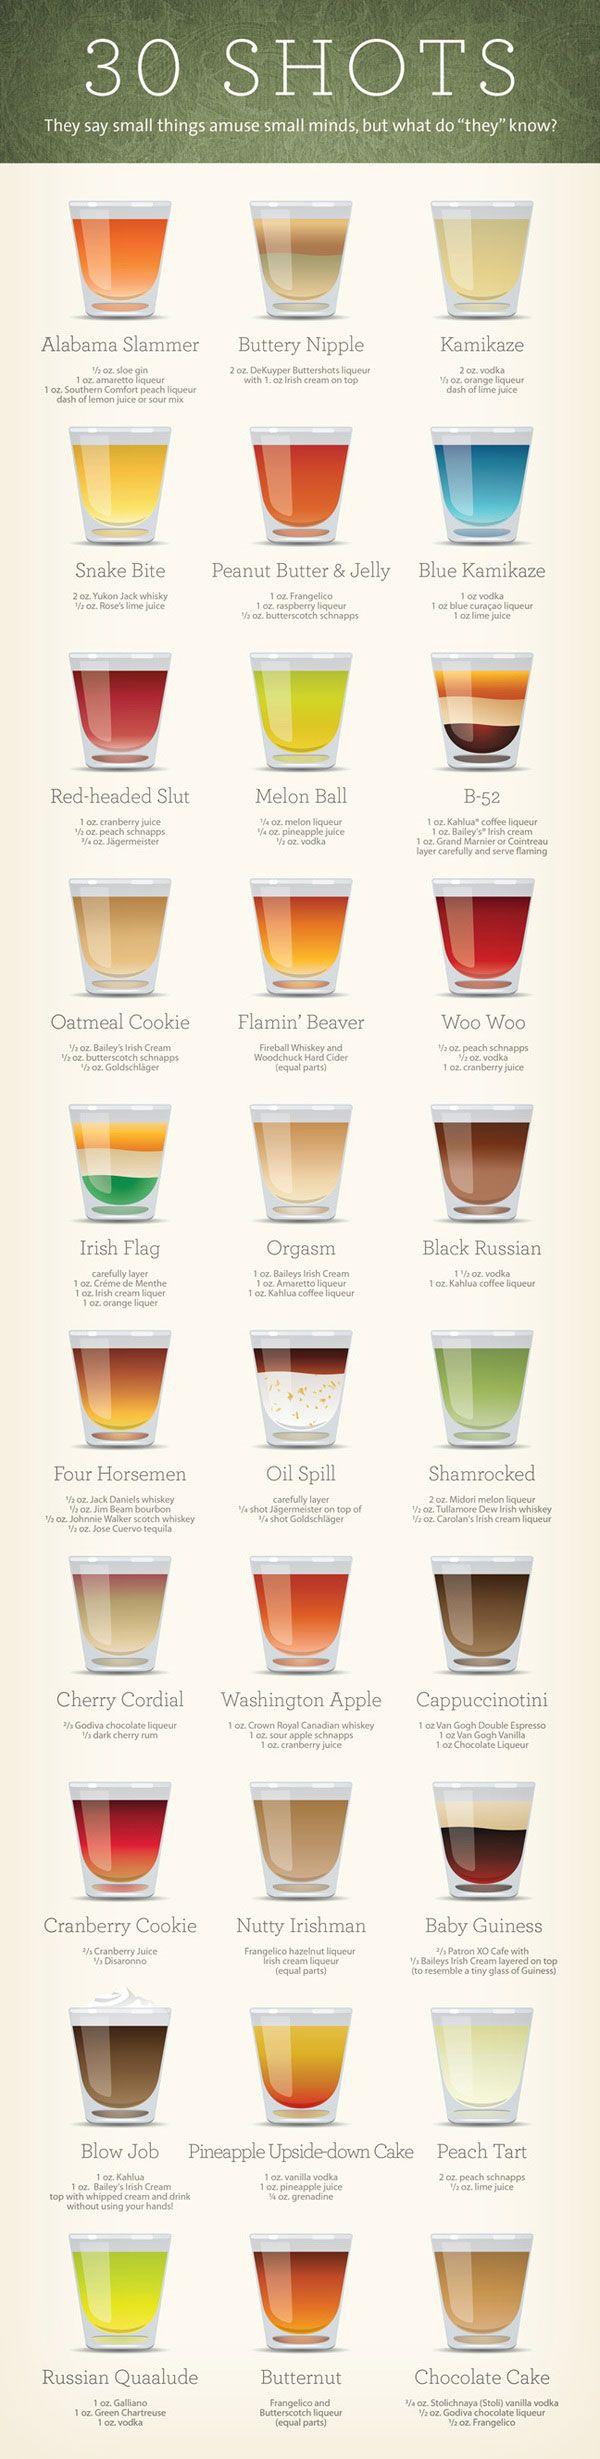 30 Shots (Infographic)